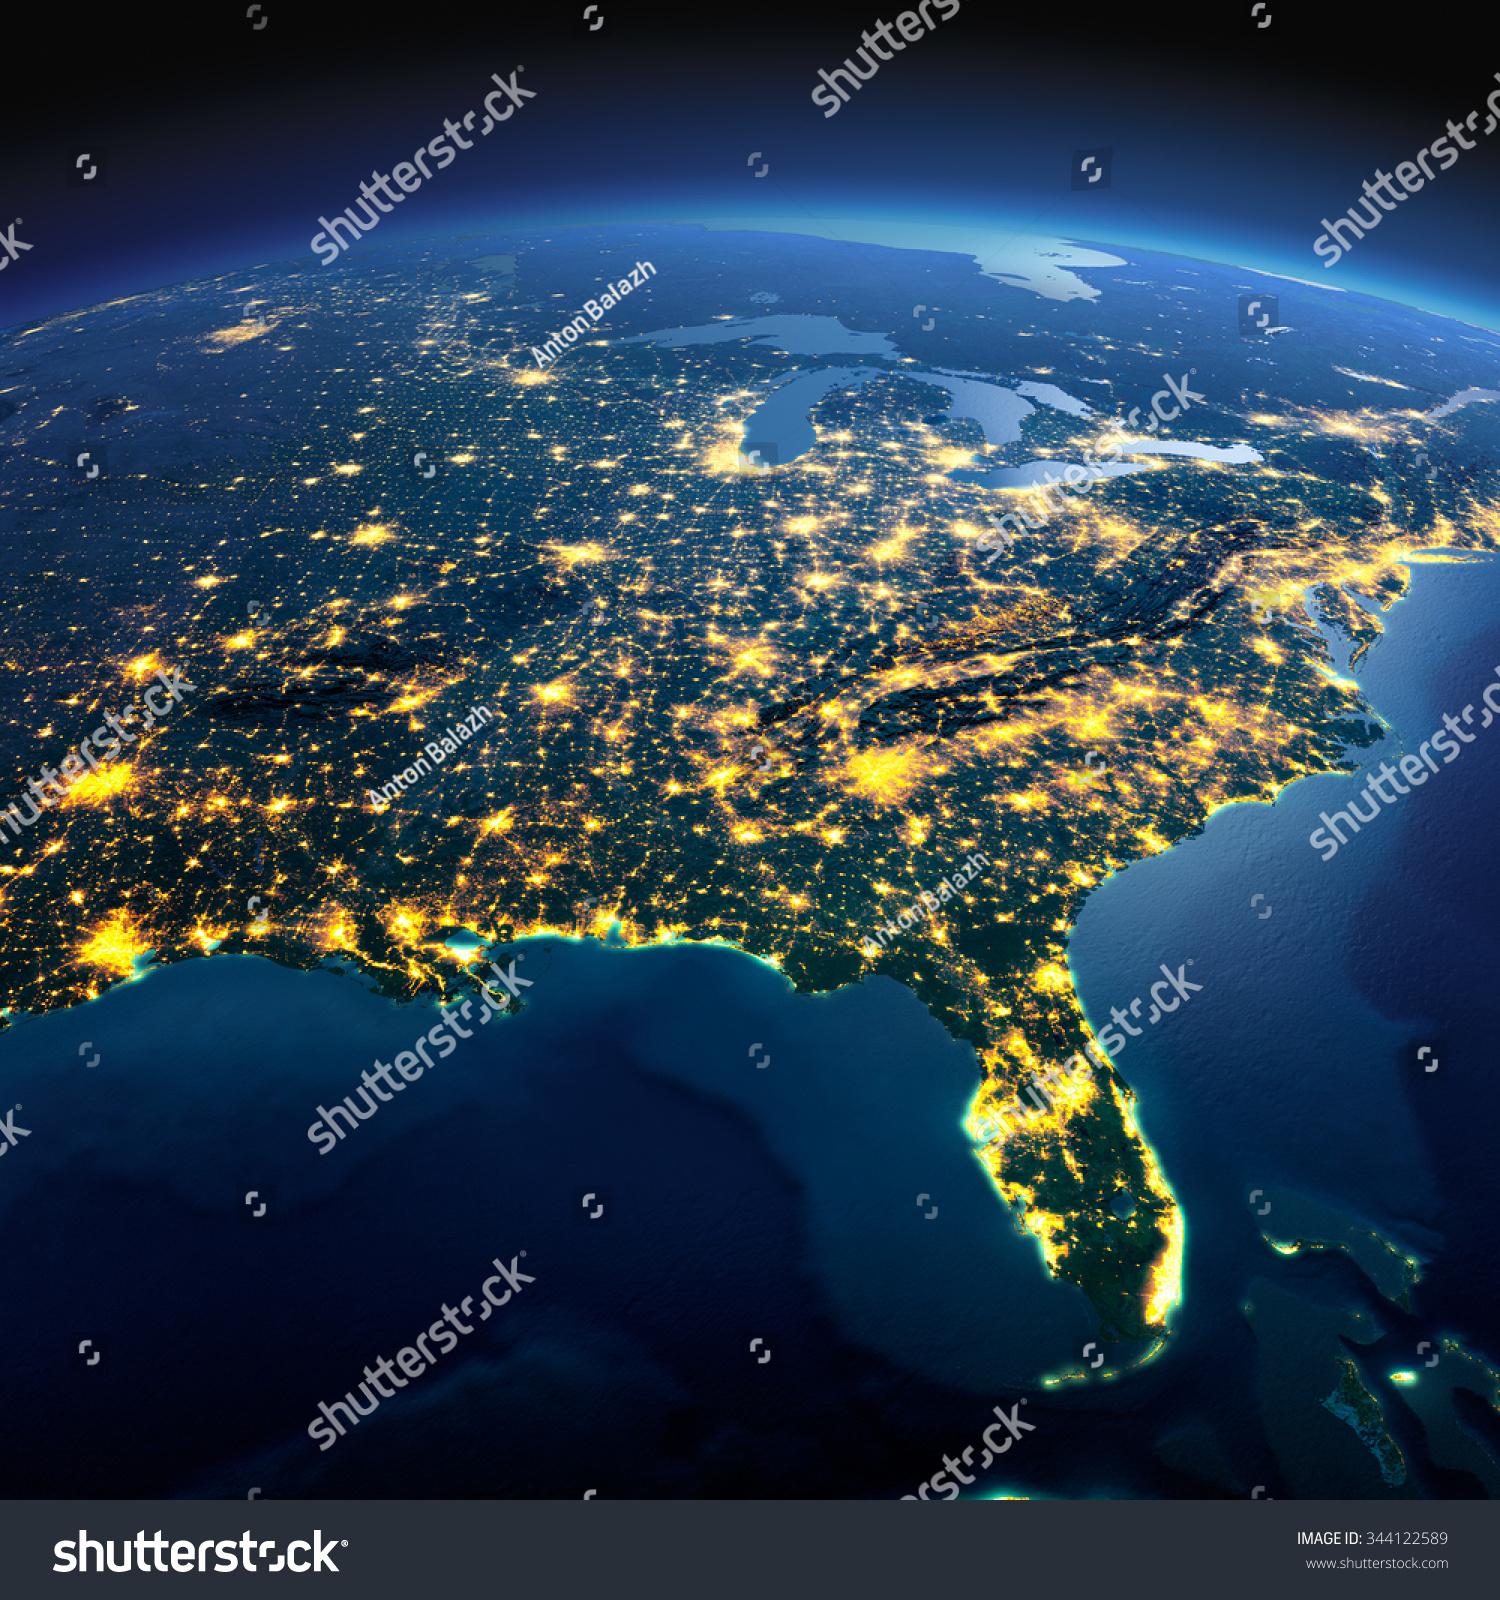 footprint north america nasa night light - photo #33